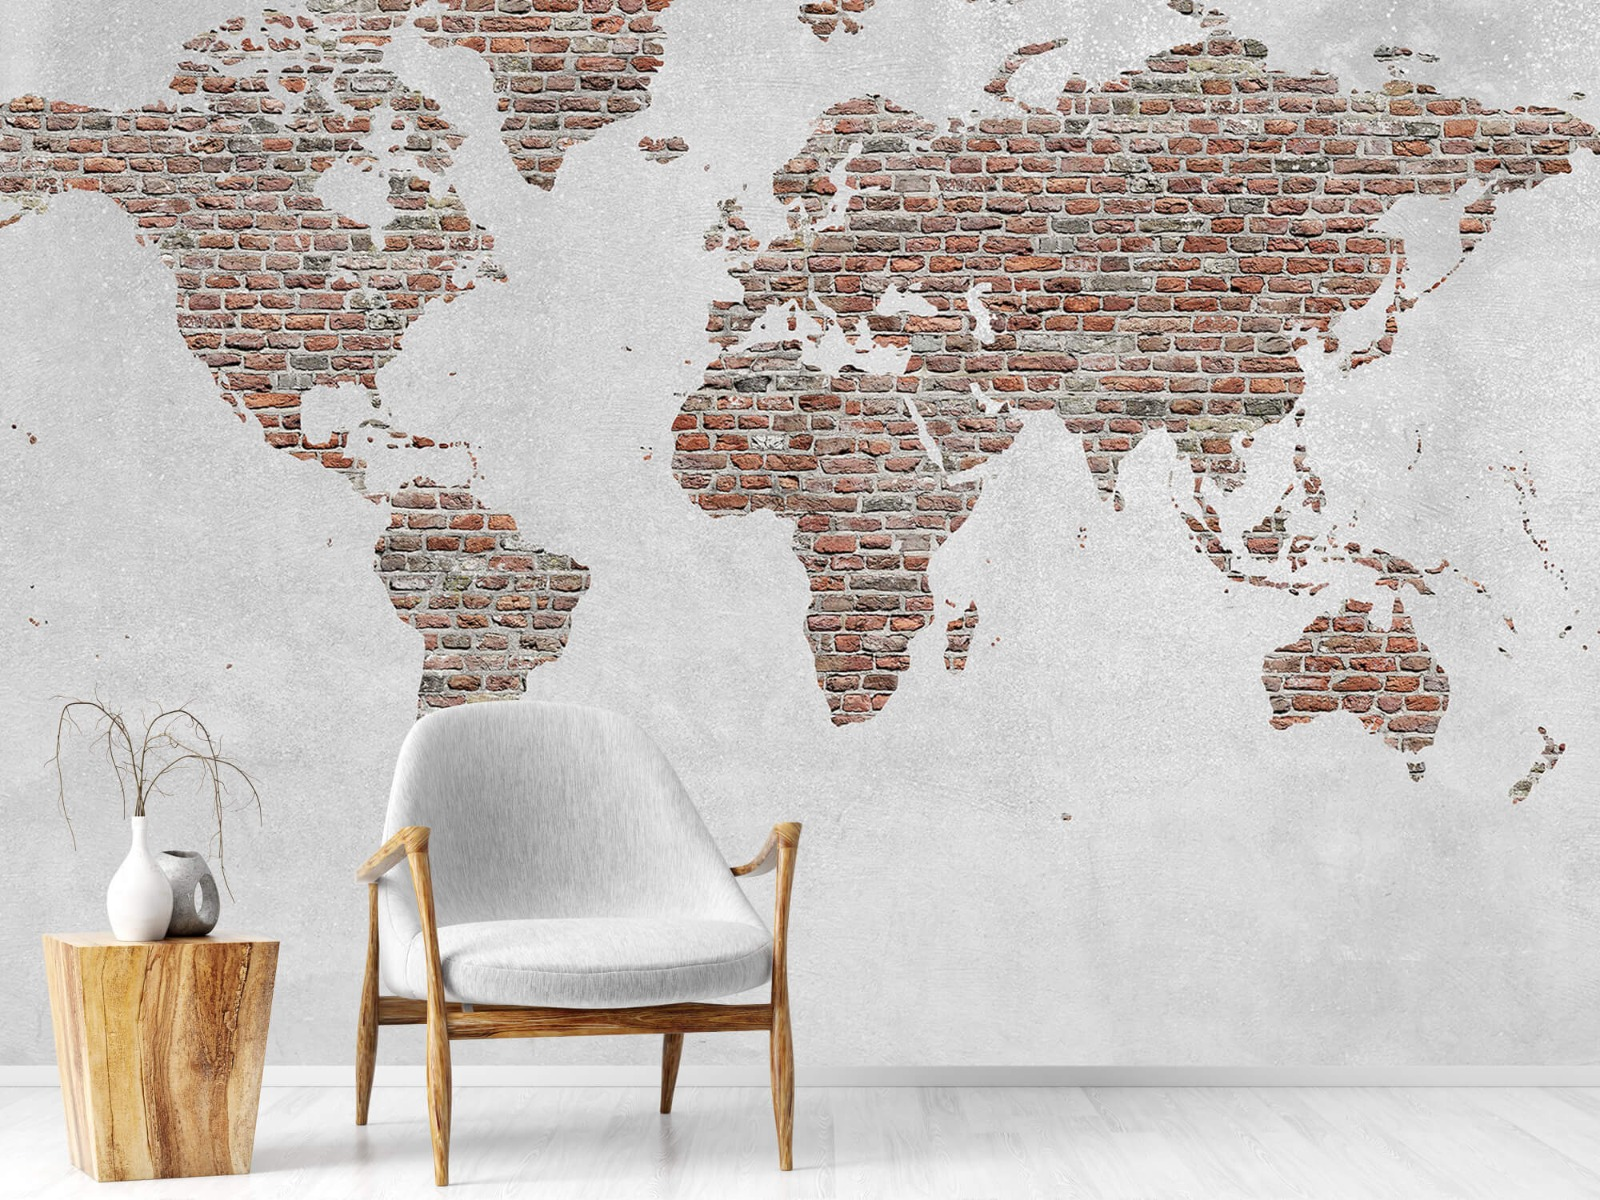 Steen behang - Wereldkaart stenen - Slaapkamer 18